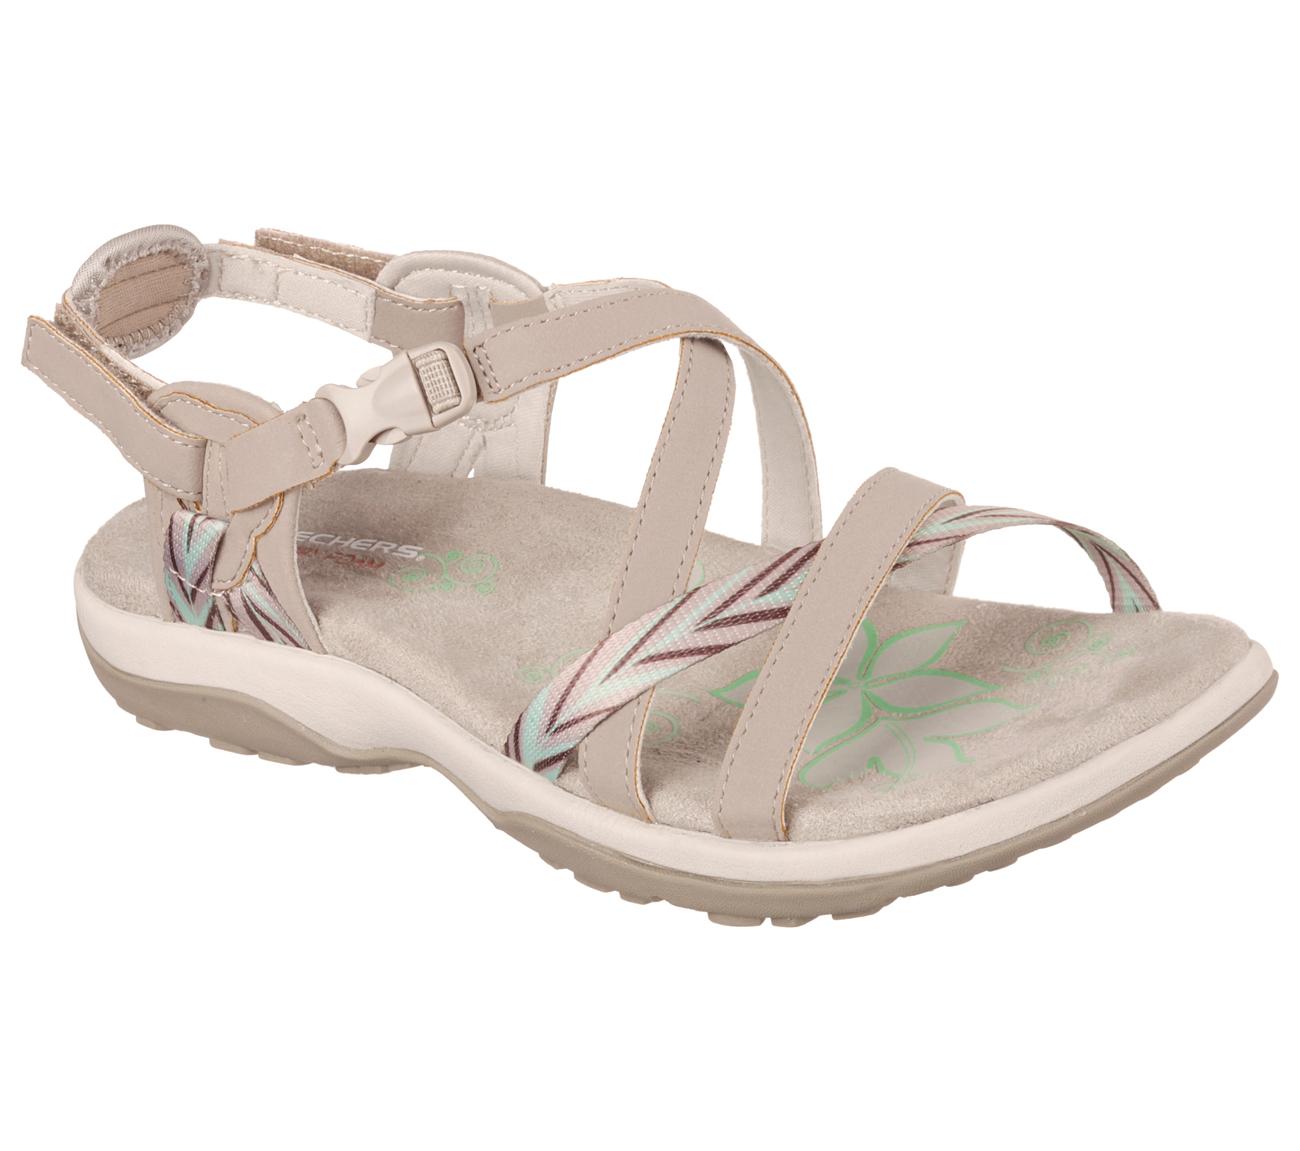 6774c75ca34e Skechers - Skechers 40780 TPE Women s REGGAE SLIM-KEEP CLOSE Sandal -  Walmart.com